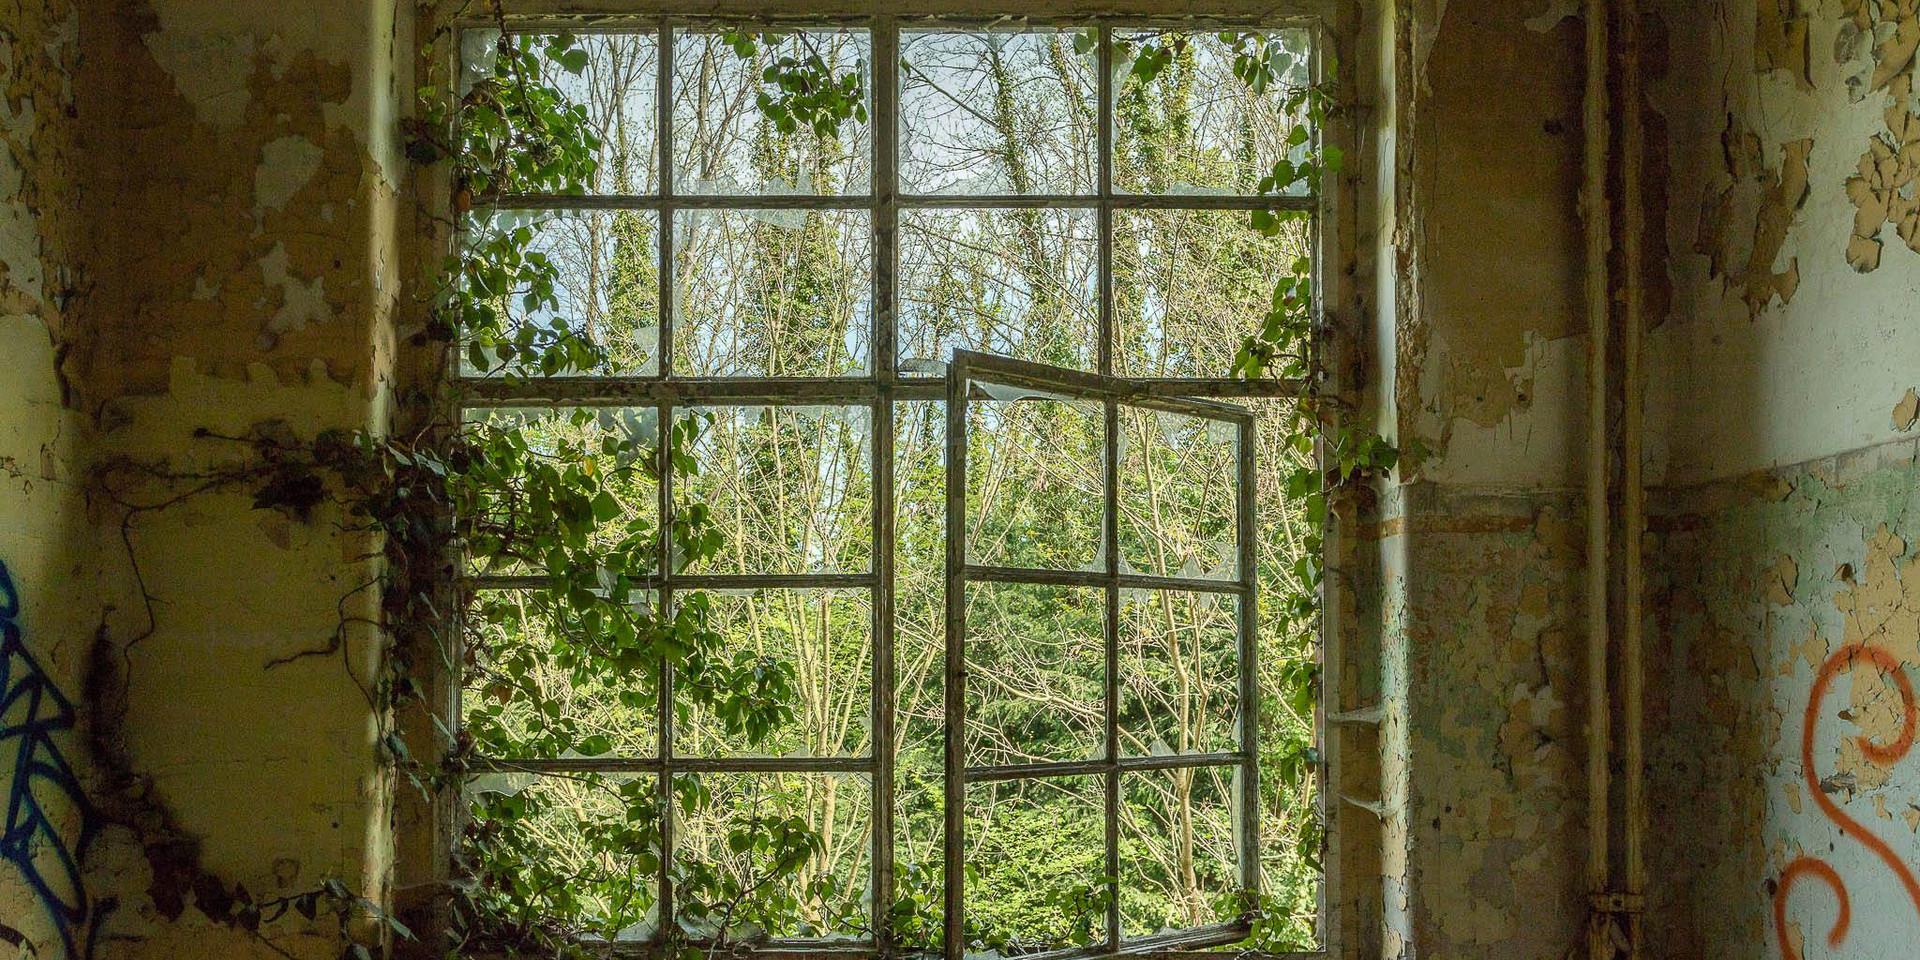 Urbex, open window into the wilderness